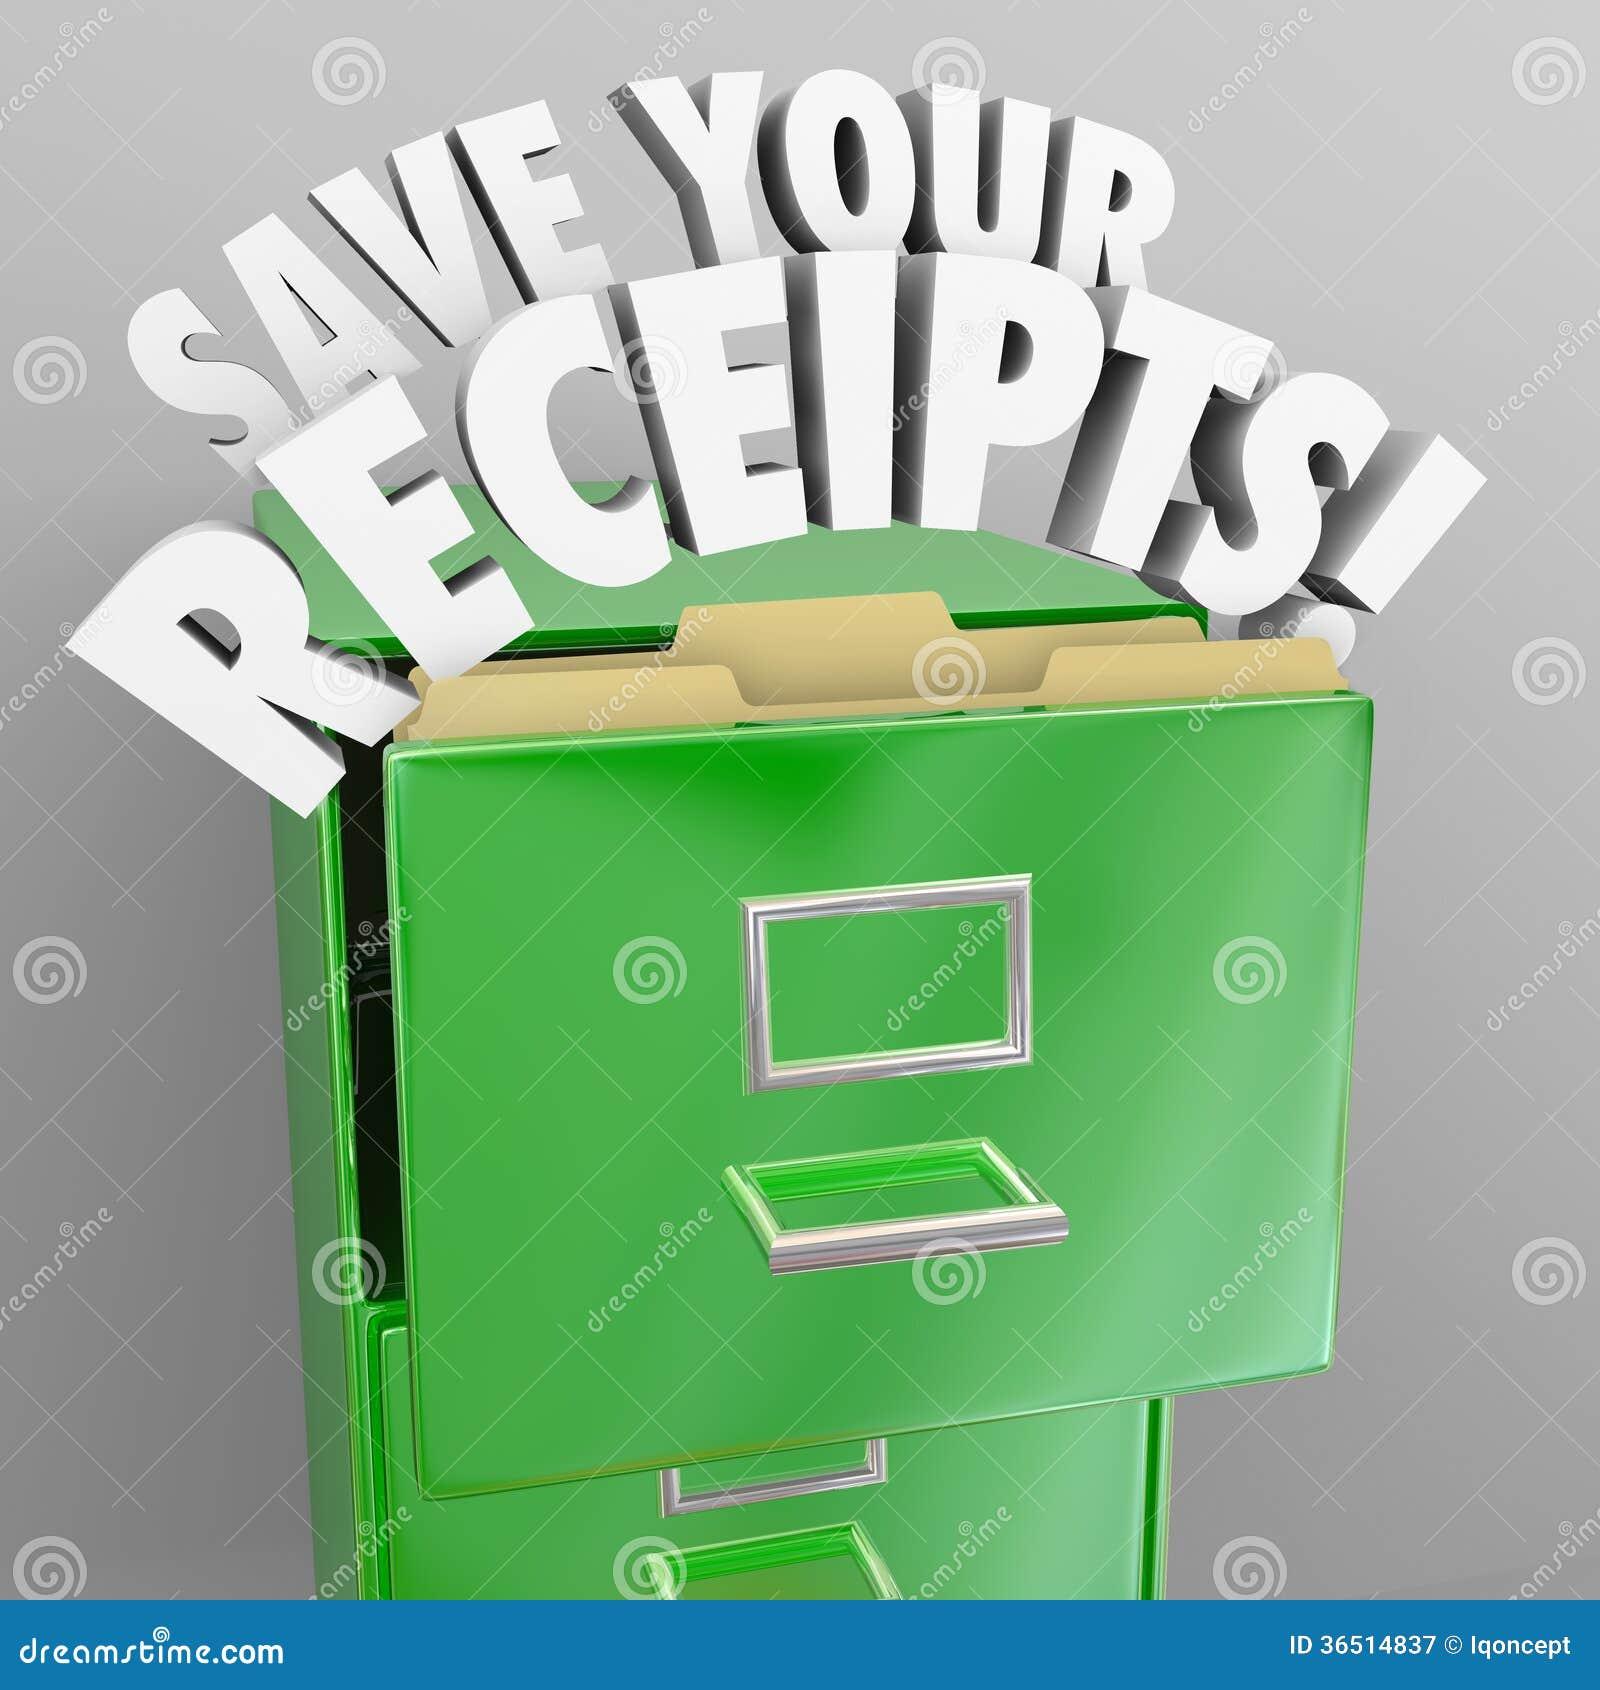 receipt clipart